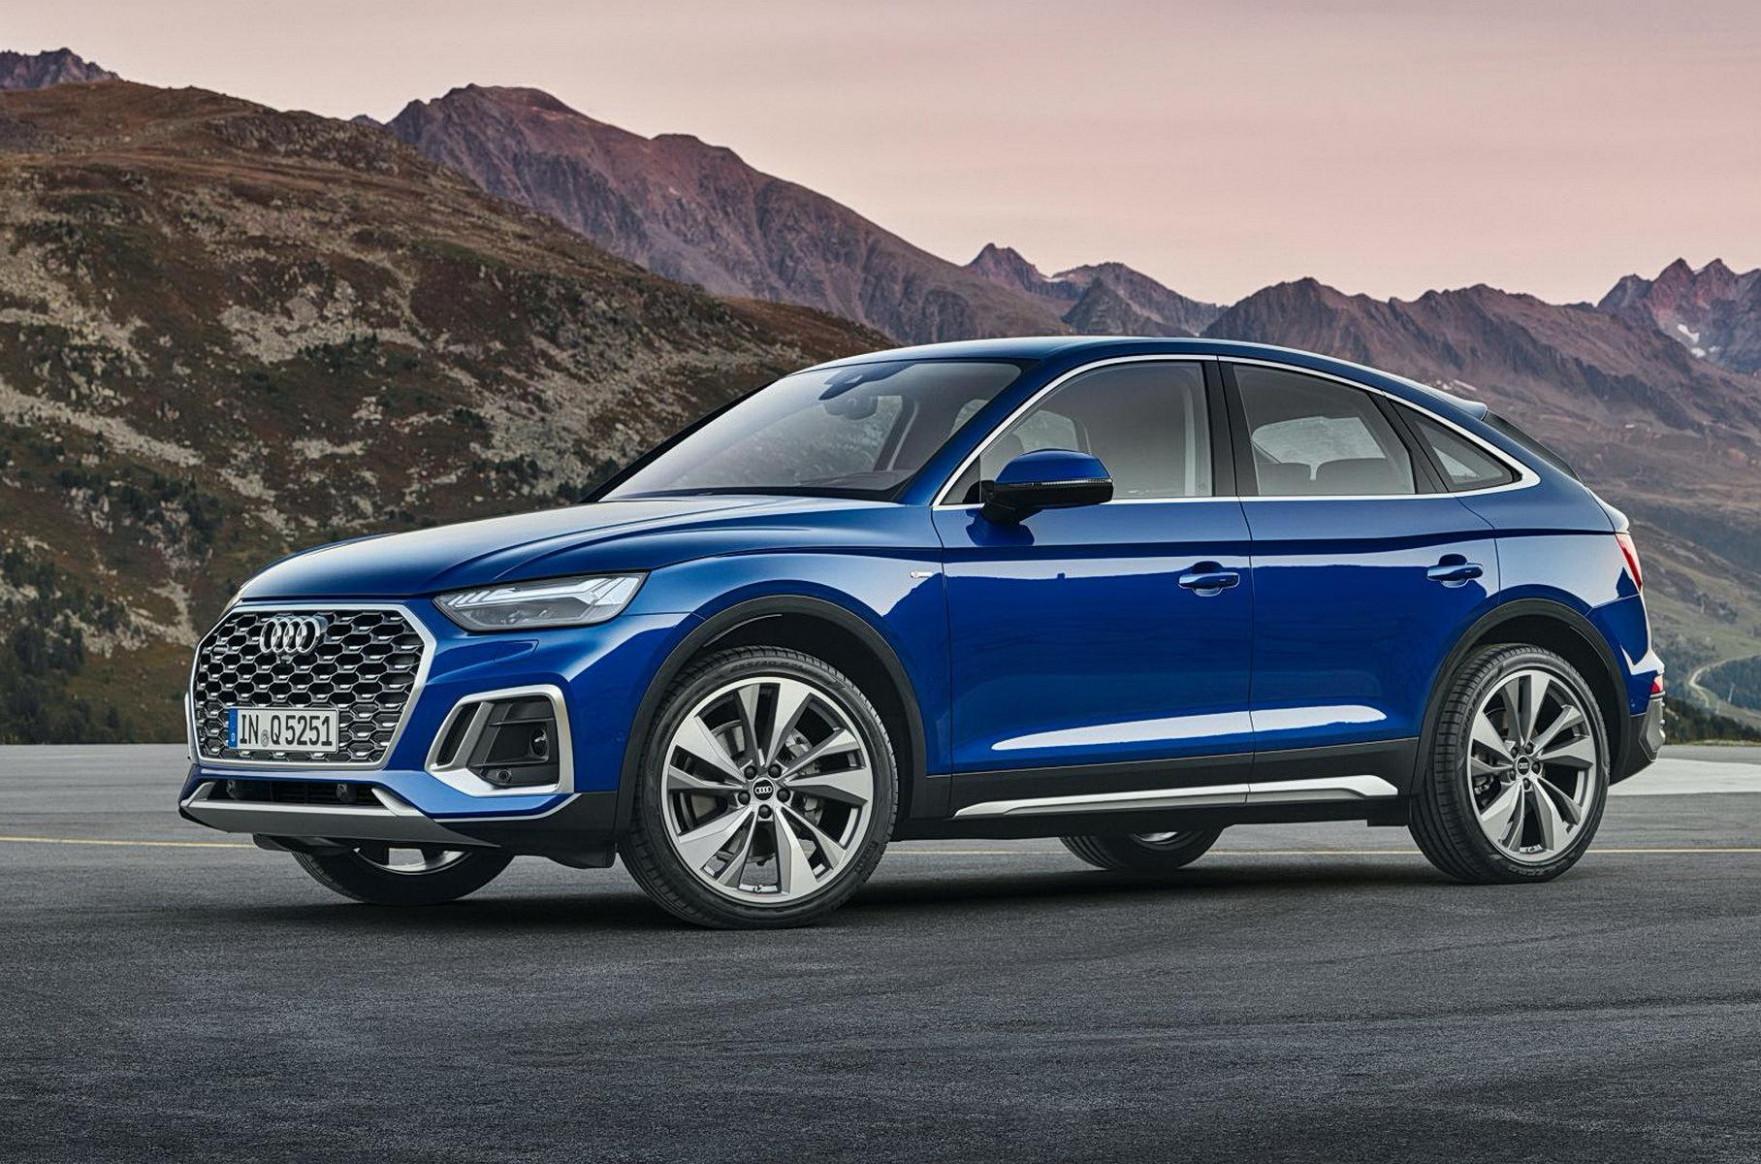 Review 2022 Audi Q5